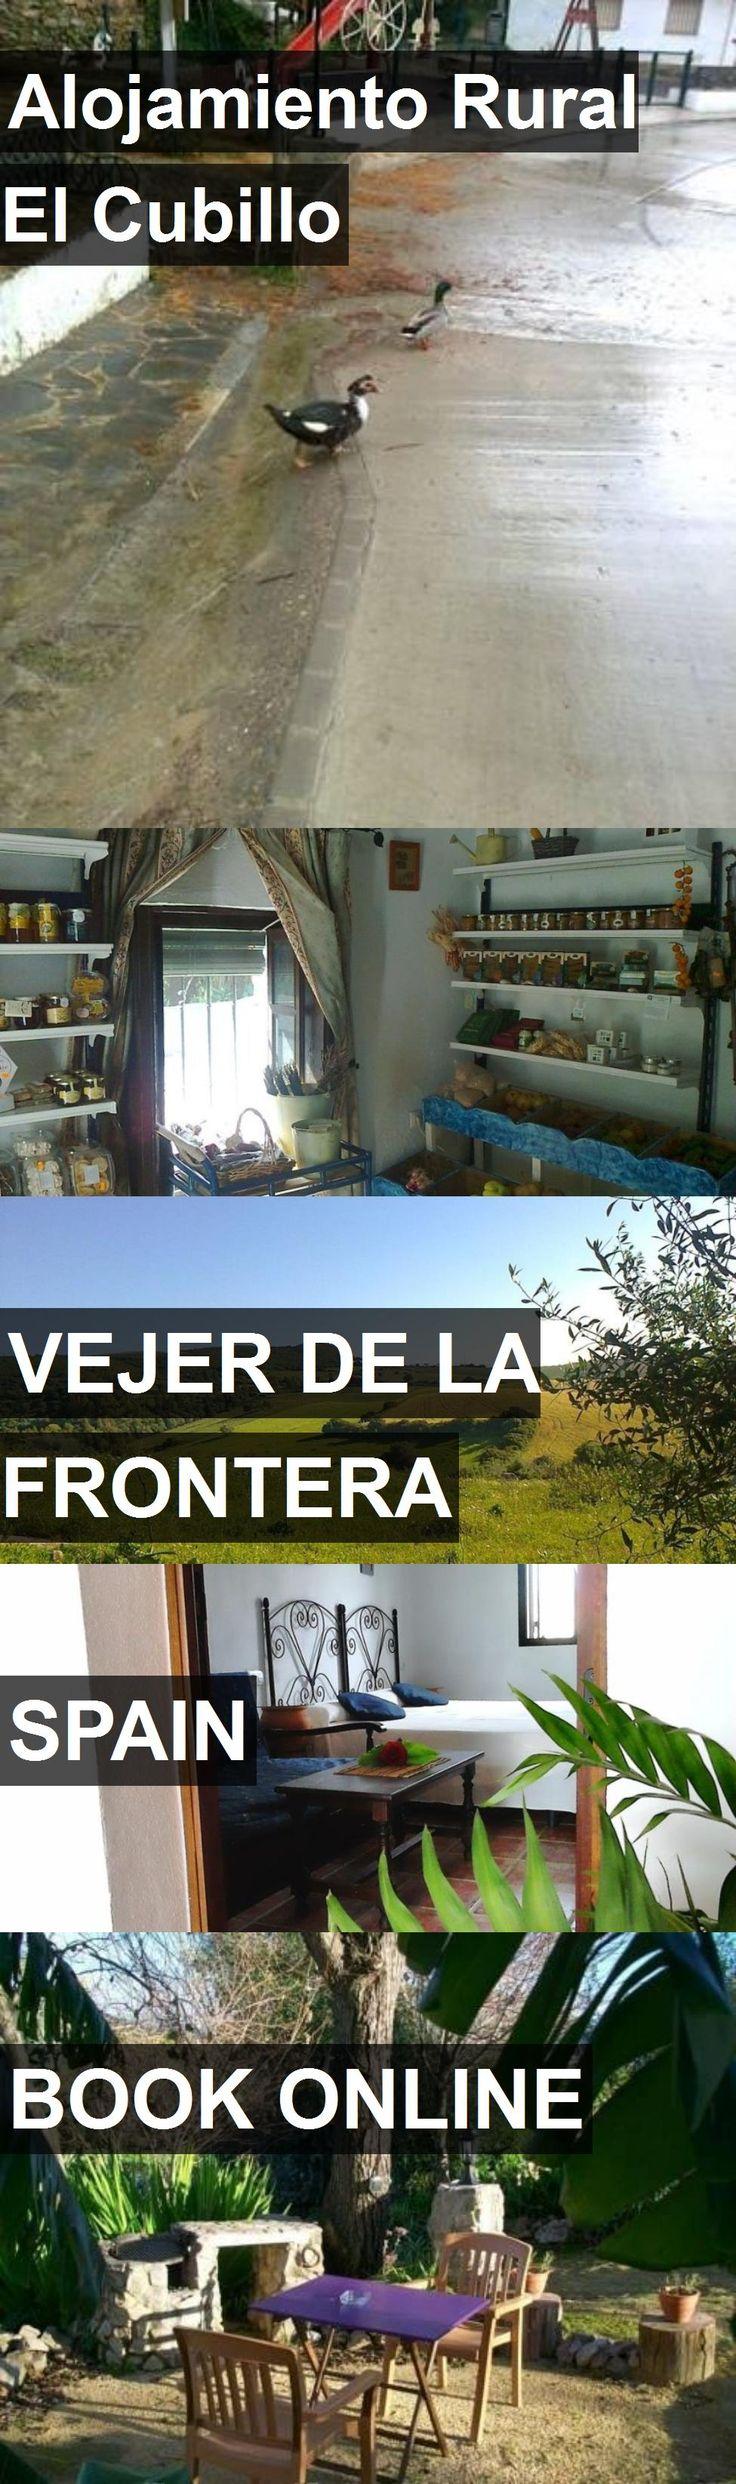 Hotel Alojamiento Rural El Cubillo in Vejer de la Frontera, Spain. For more information, photos, reviews and best prices please follow the link. #Spain #VejerdelaFrontera #AlojamientoRuralElCubillo #hotel #travel #vacation